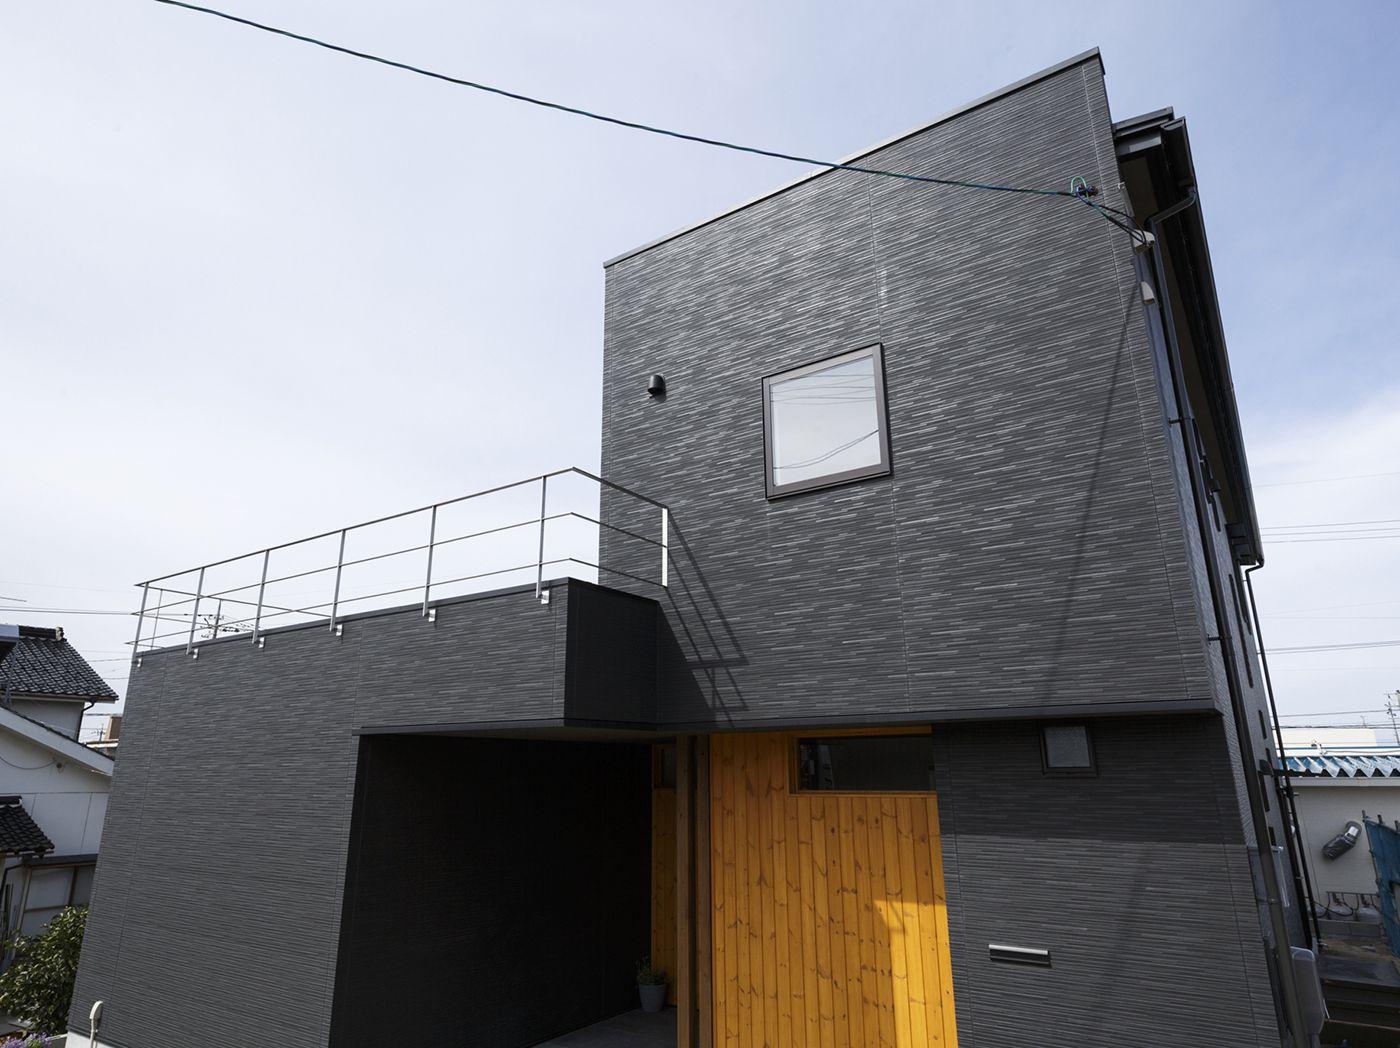 Kmew ケイミュー株式会社 屋根 外壁 雨とい 施工事例集 事例詳細